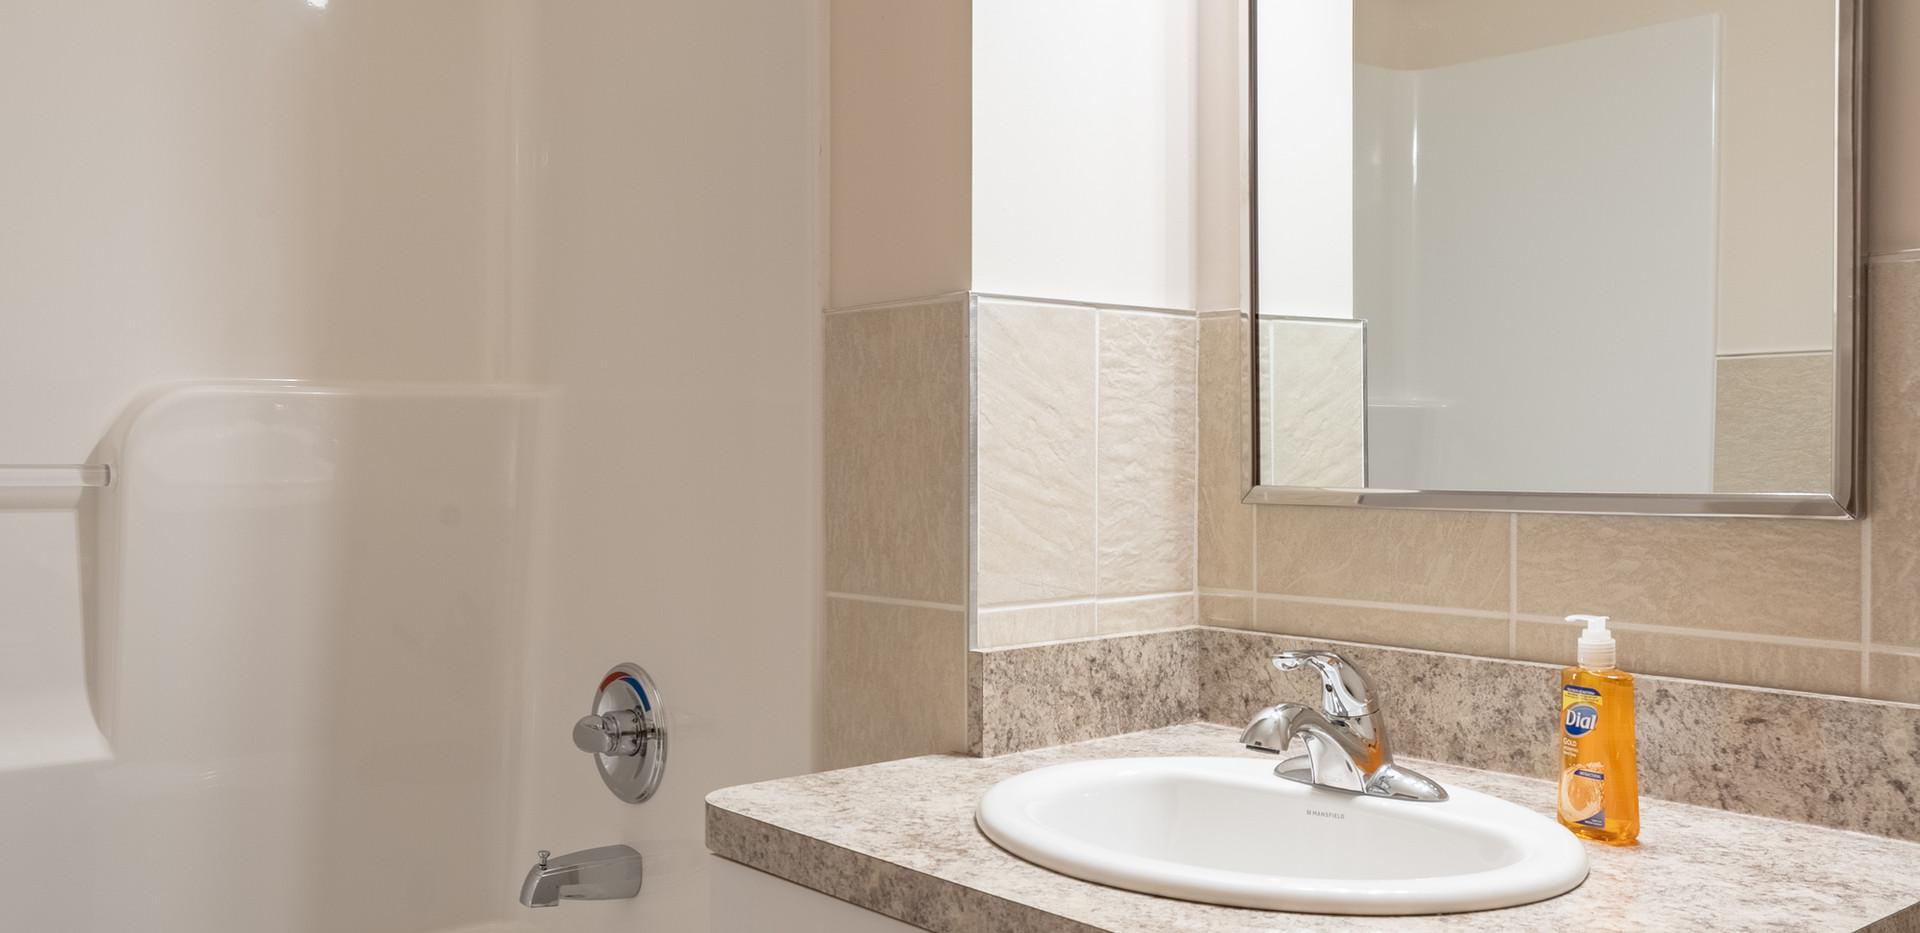 Transitional Apartment - Bathroom